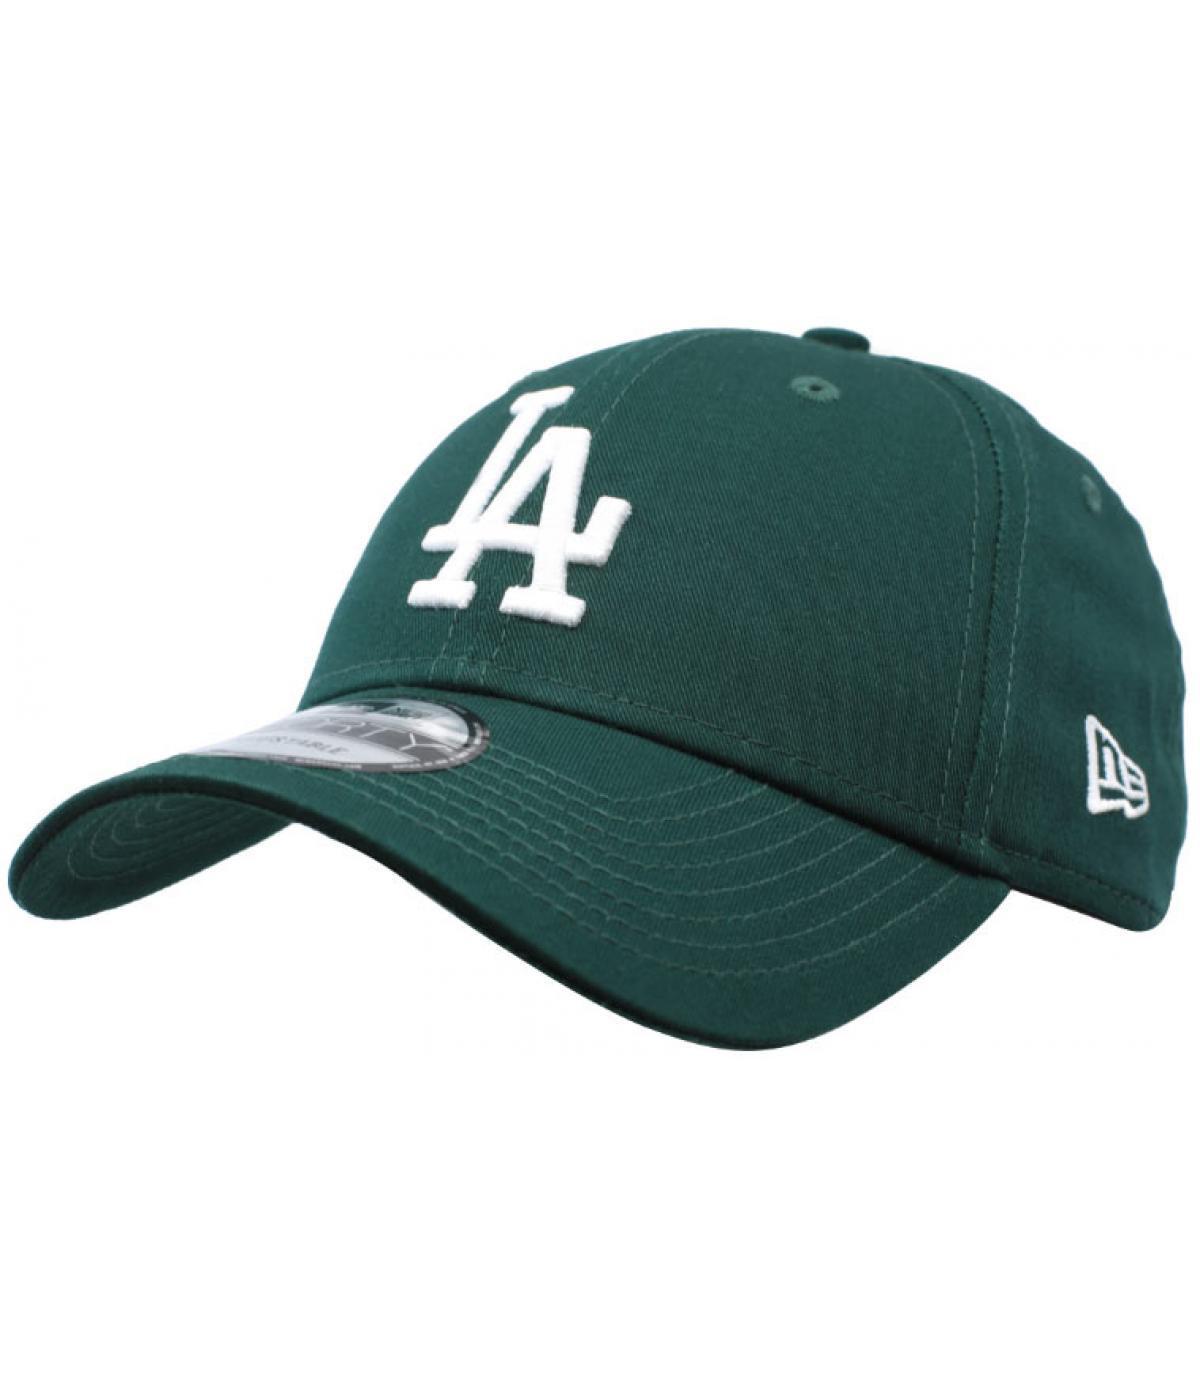 green LA child cap